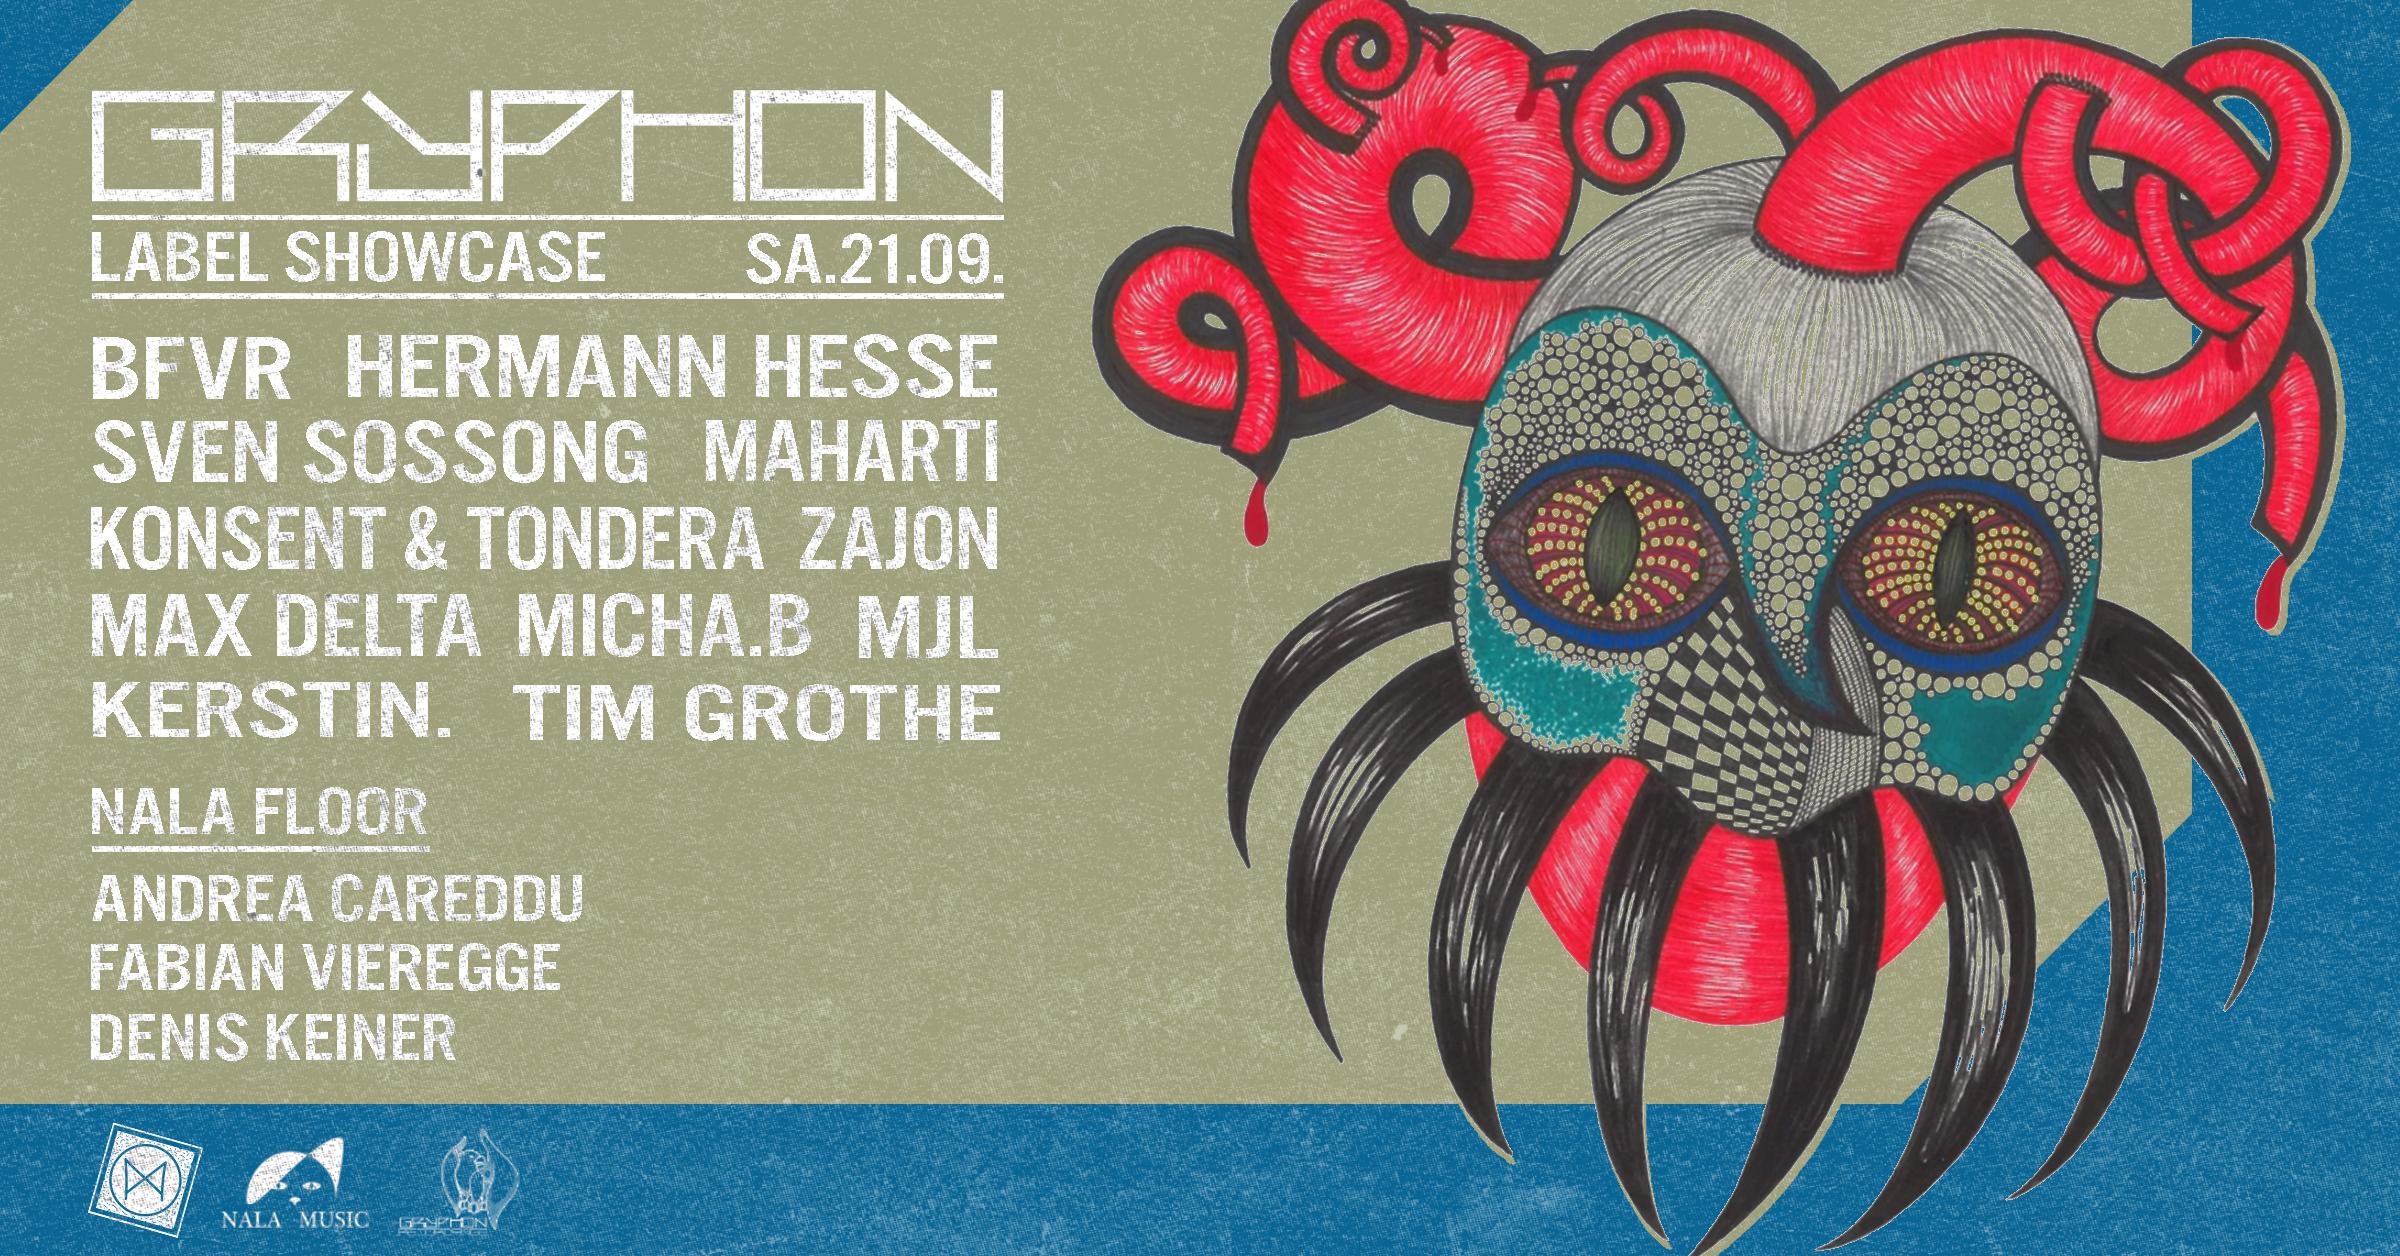 Gryphon Label Showcase